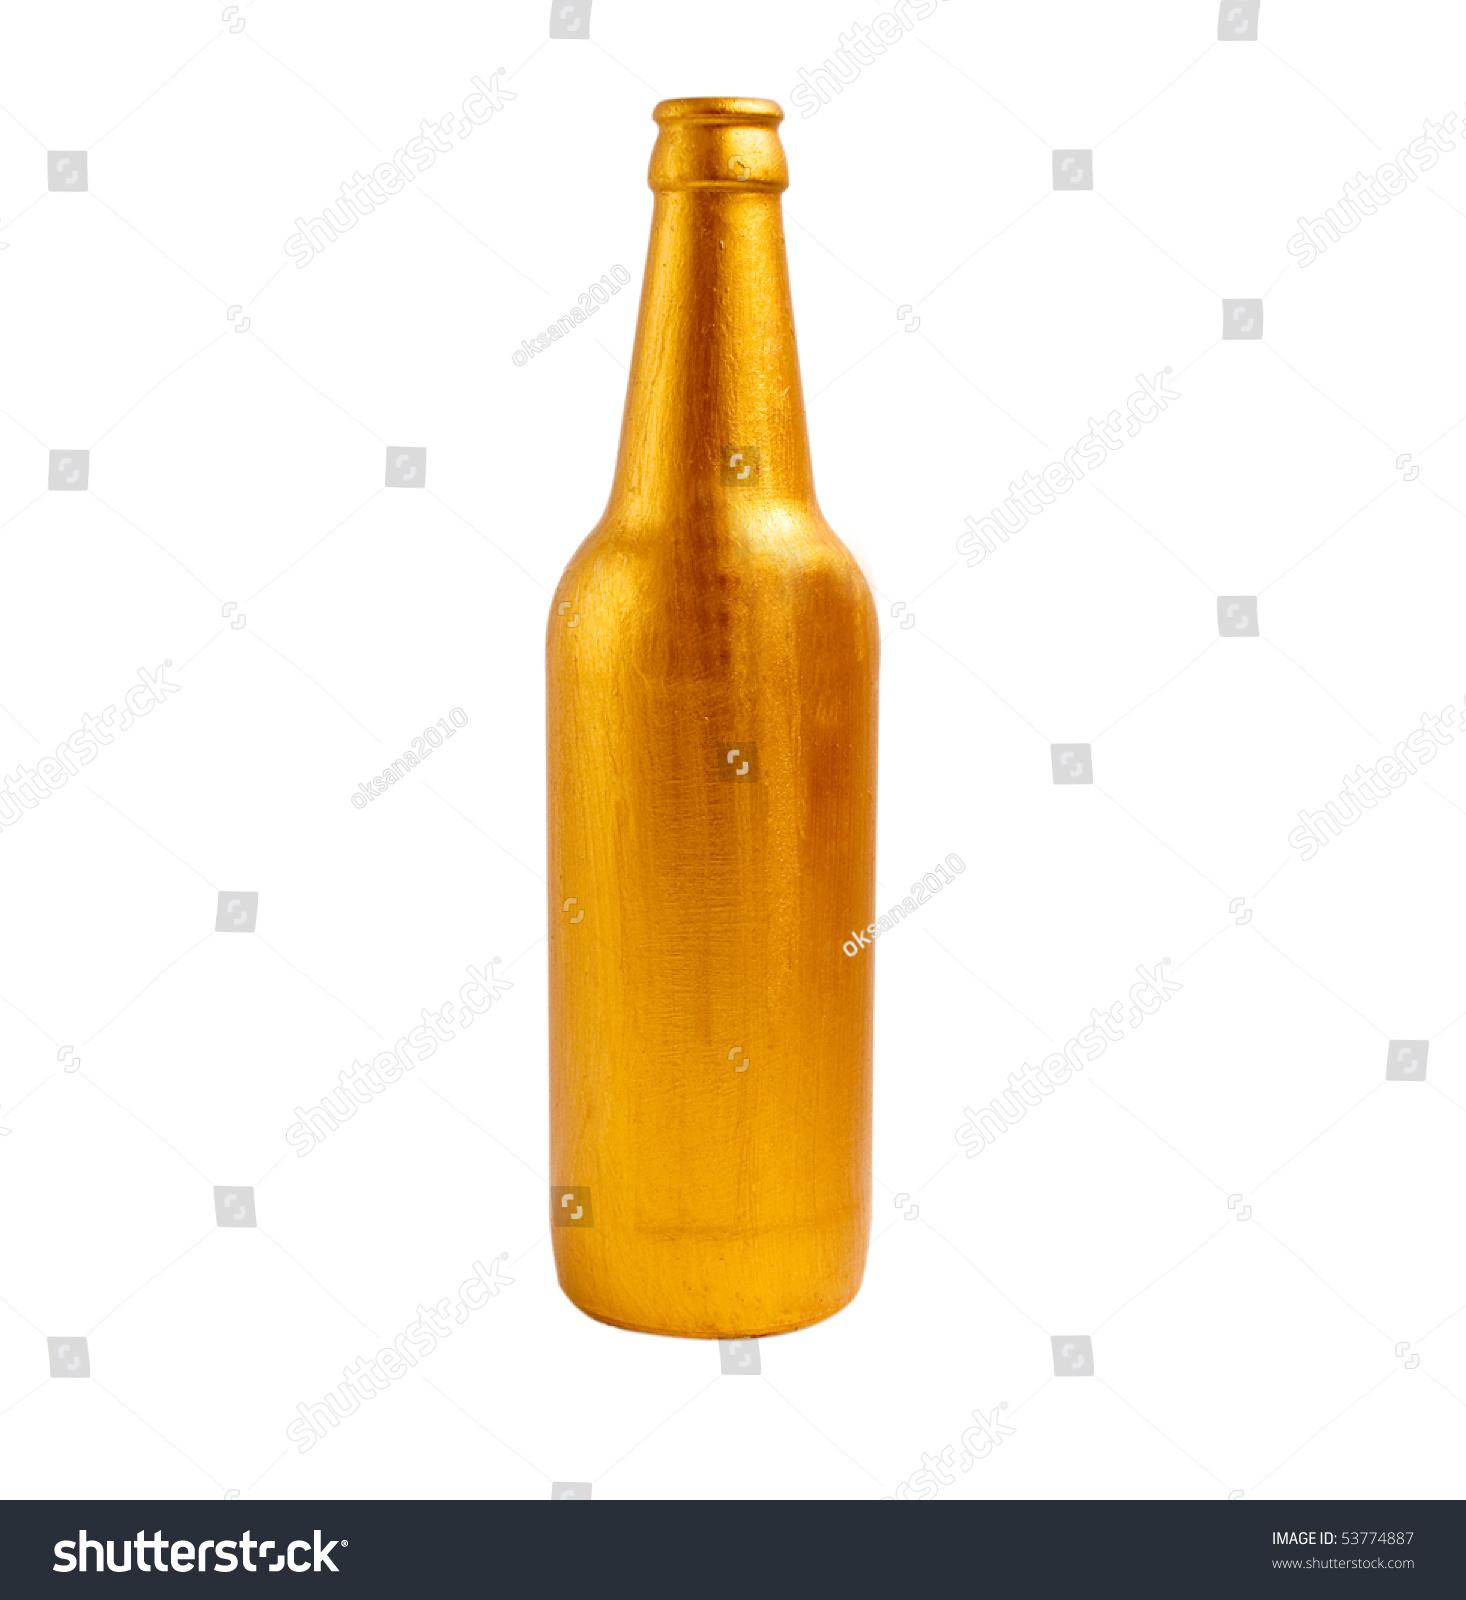 Golden Bottle On White Background Stock Photo (Royalty Free ...